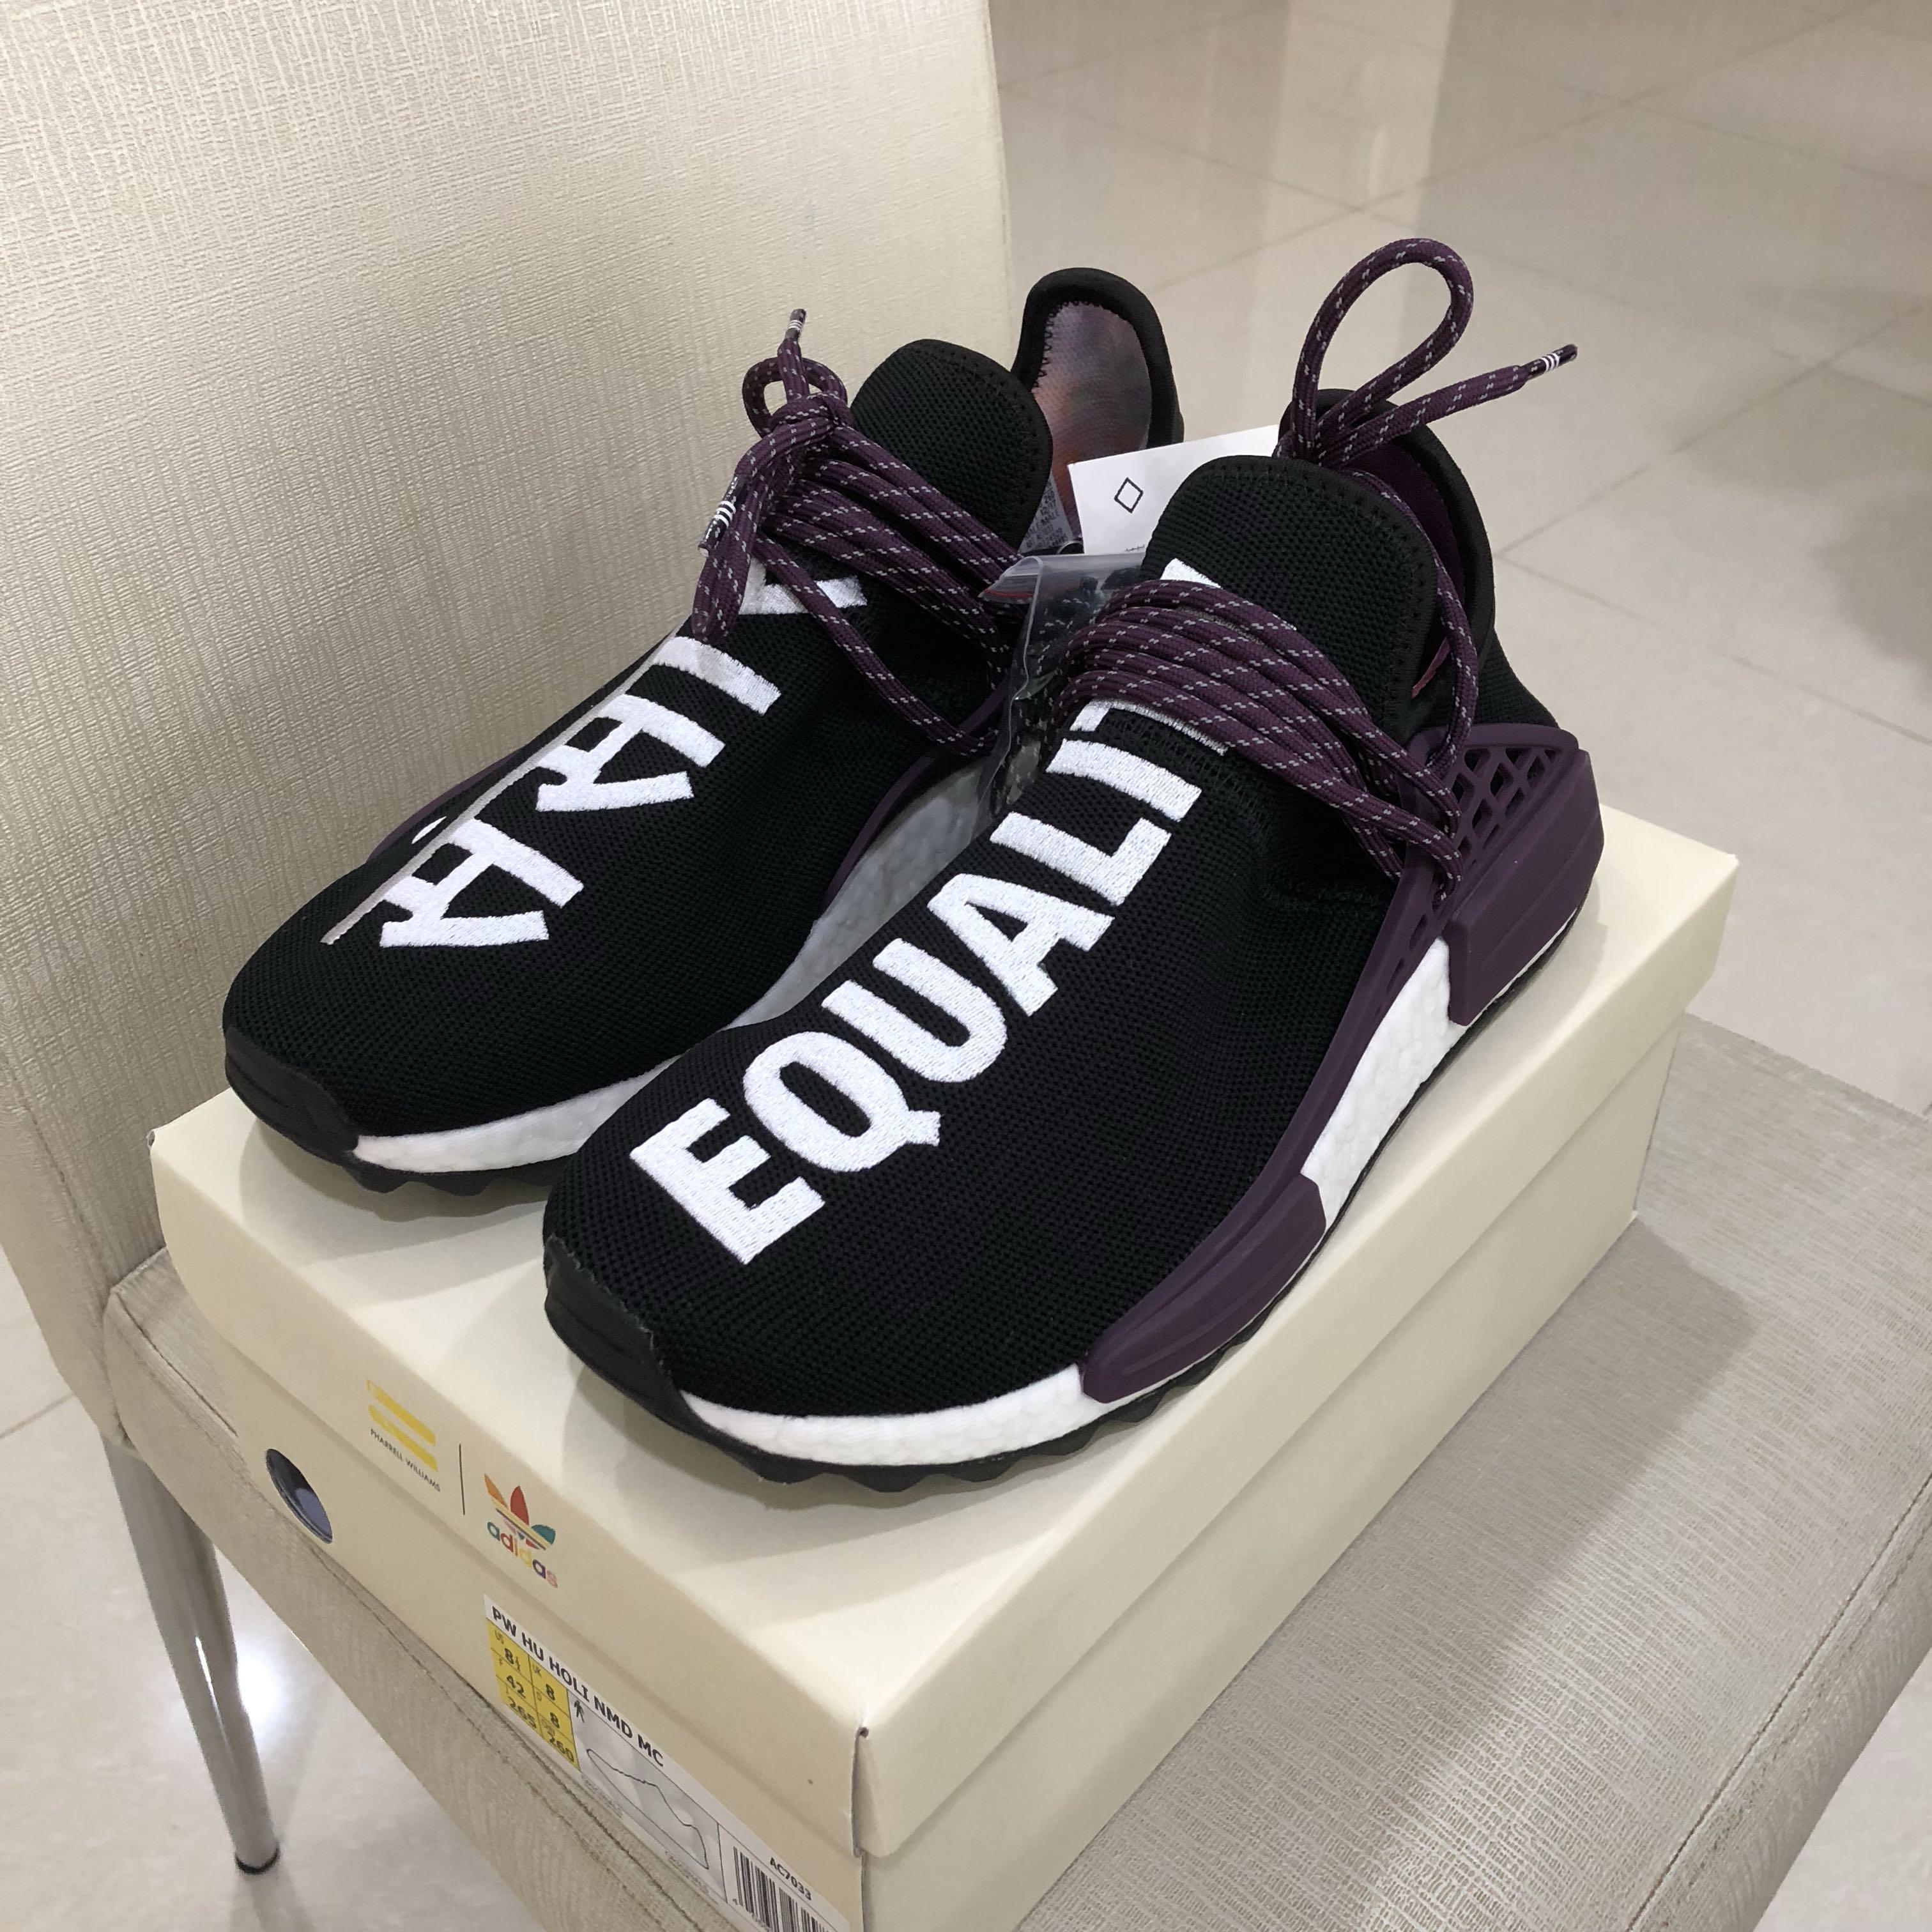 38b583b071f9d Pharrell Williams Adidas Nmd Hu Holi - Best Pictures Of Adidas ...